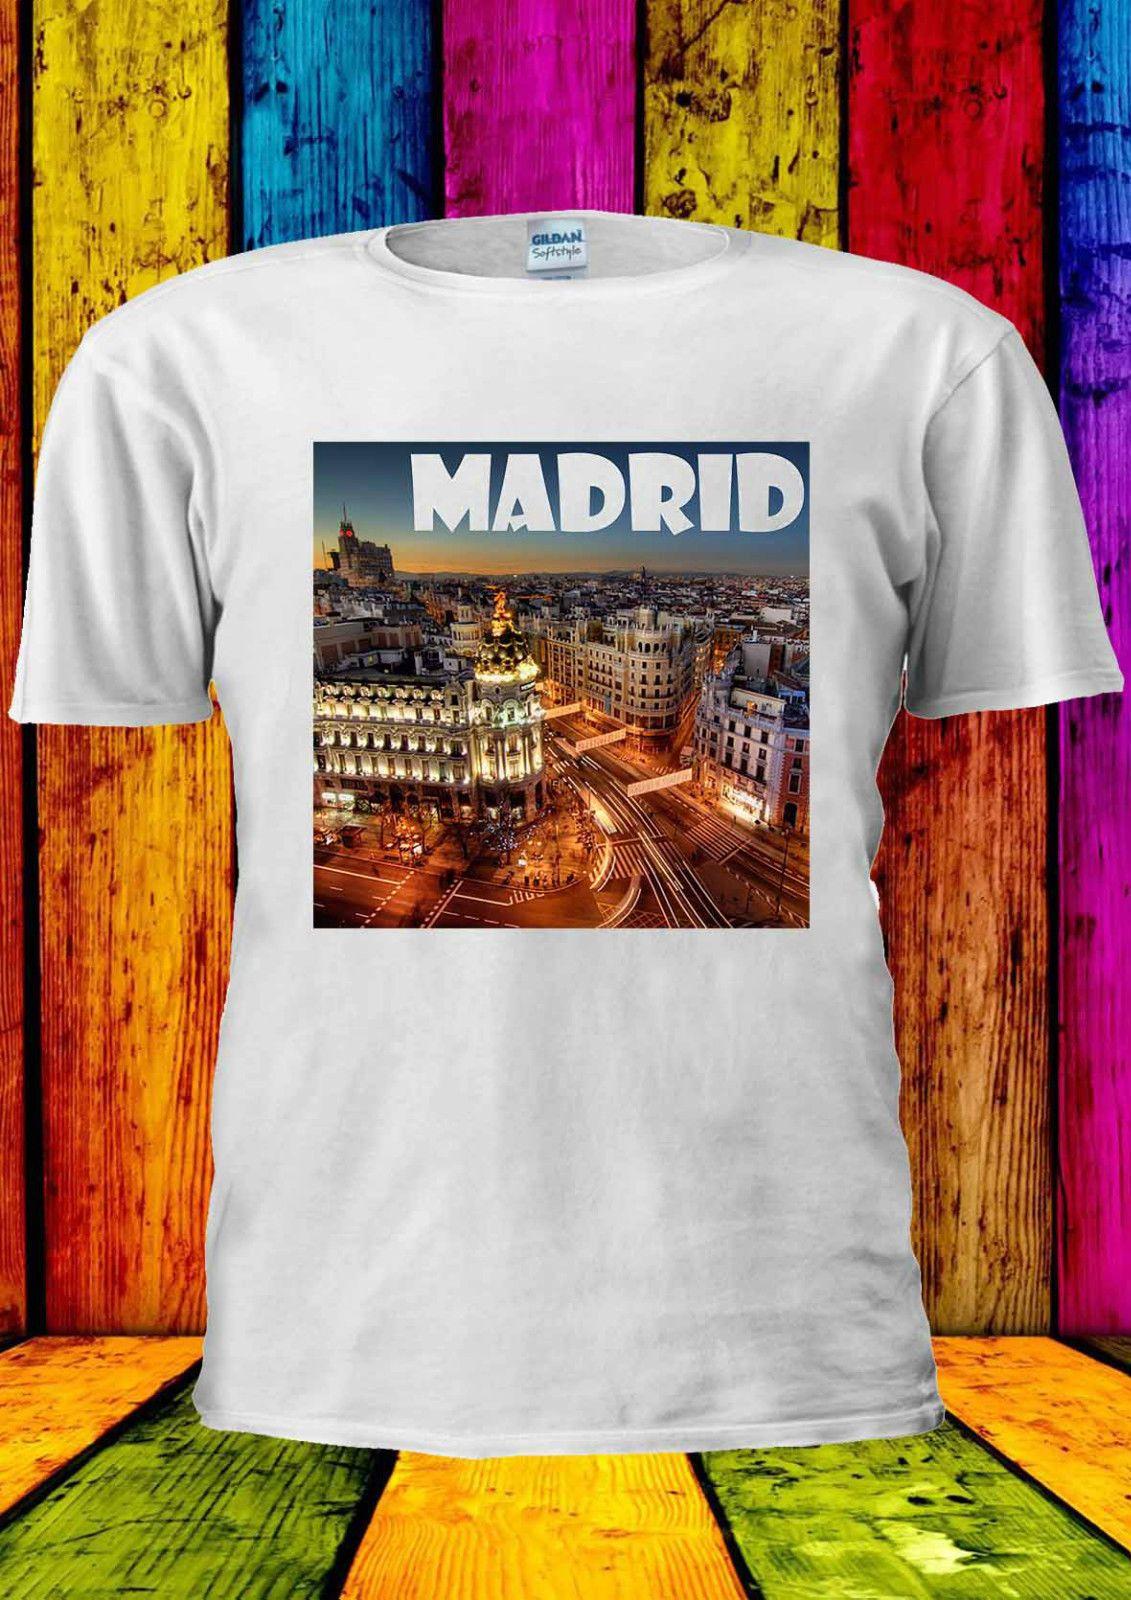 8169c4eed3d0 Madrid Spain Dream City Tumblr T Shirt Vest Tee Tops Men Women Cool Casual  Pride T Shirt Men Unisex New Fashion Tshirt Cool Tee Designs Tees Shirts  Cheap ...